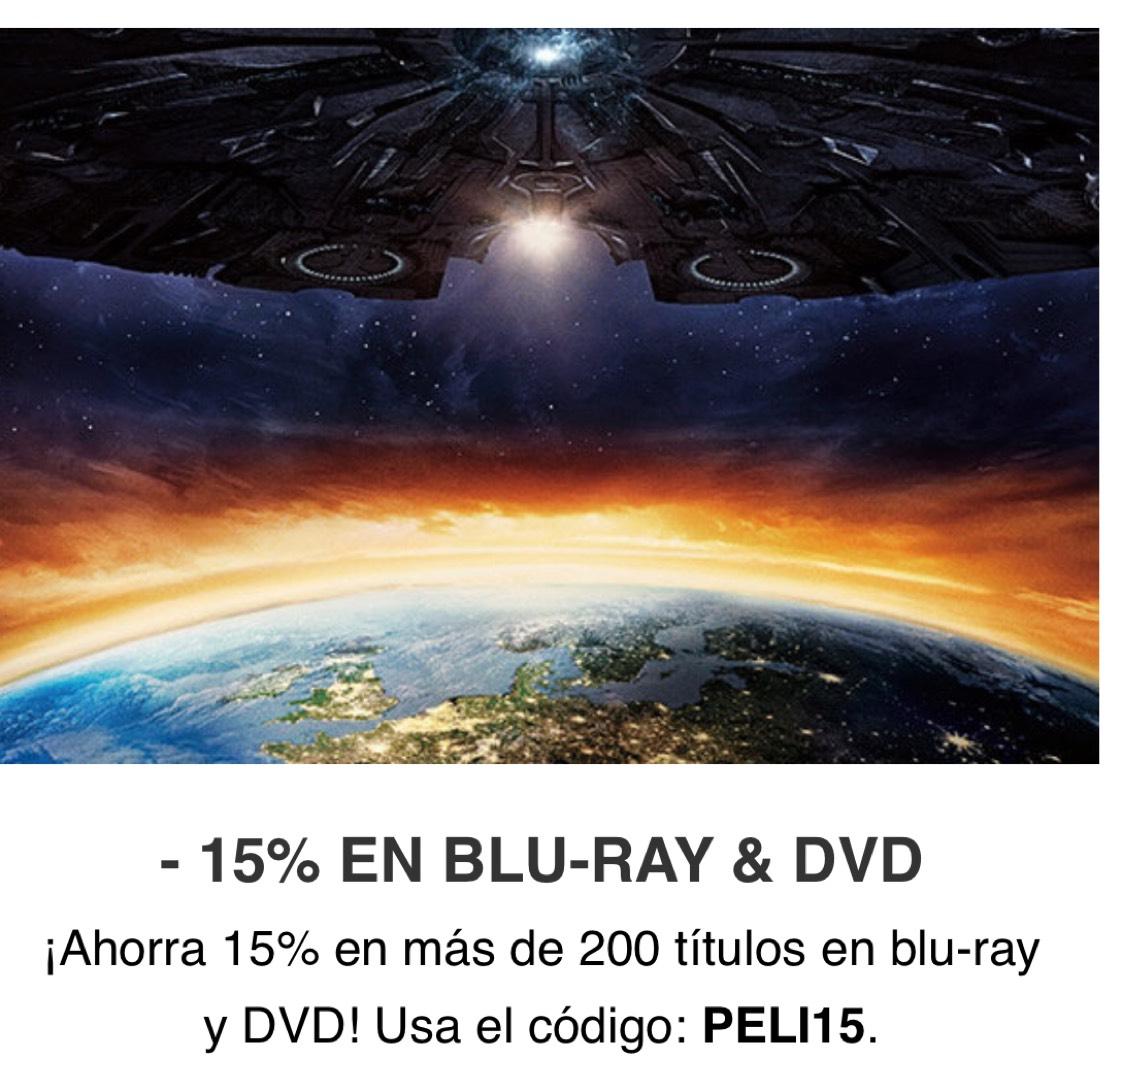 15% EN BLU-RAY Y DVD